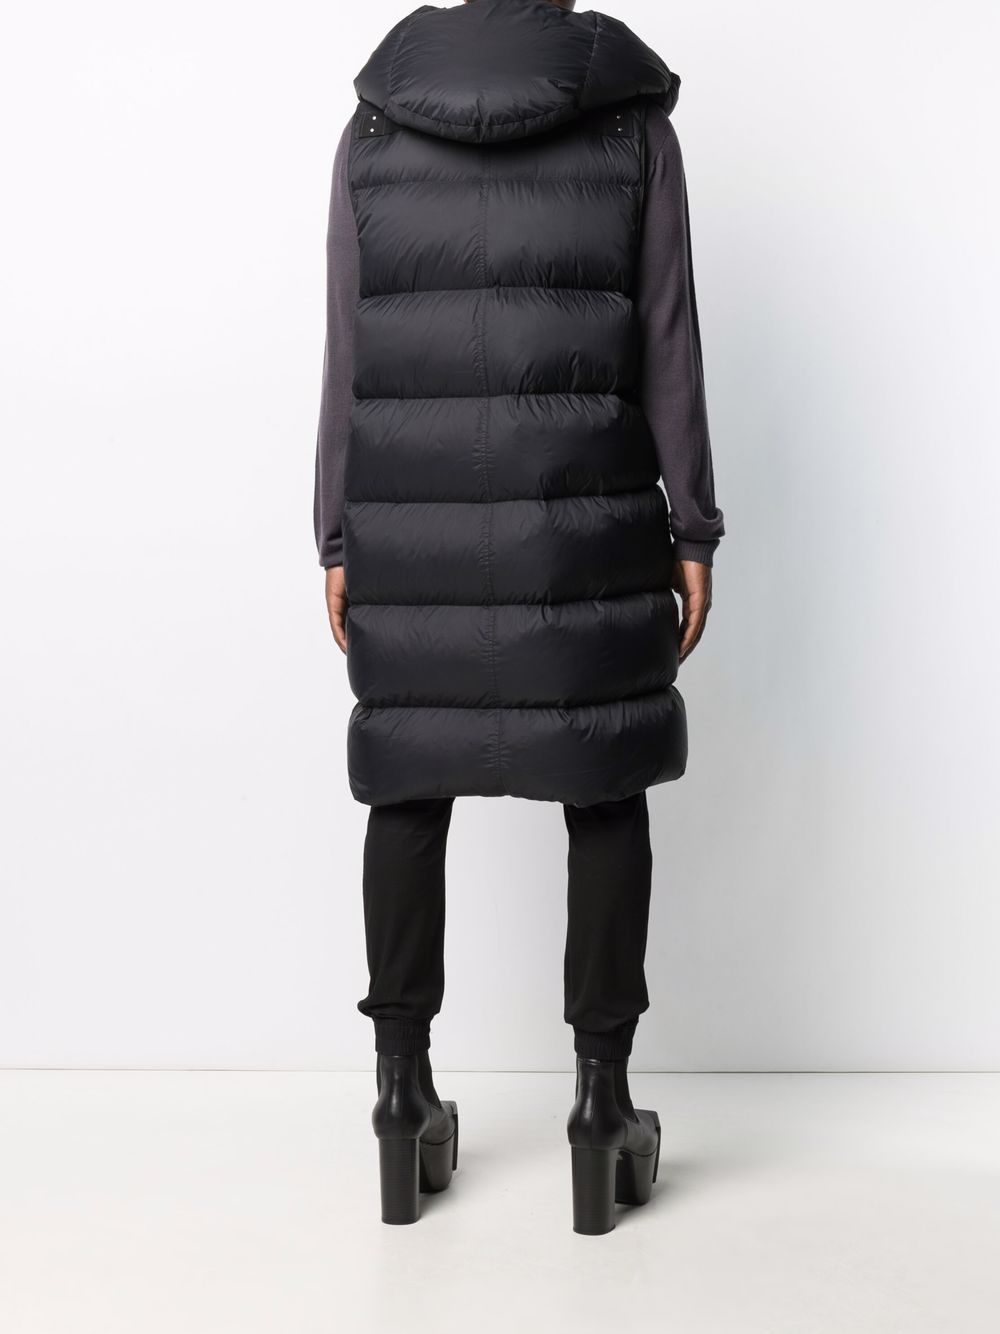 sleeveless down jacket man black  RICK OWENS | Jackets | RU02A5999 NZD309